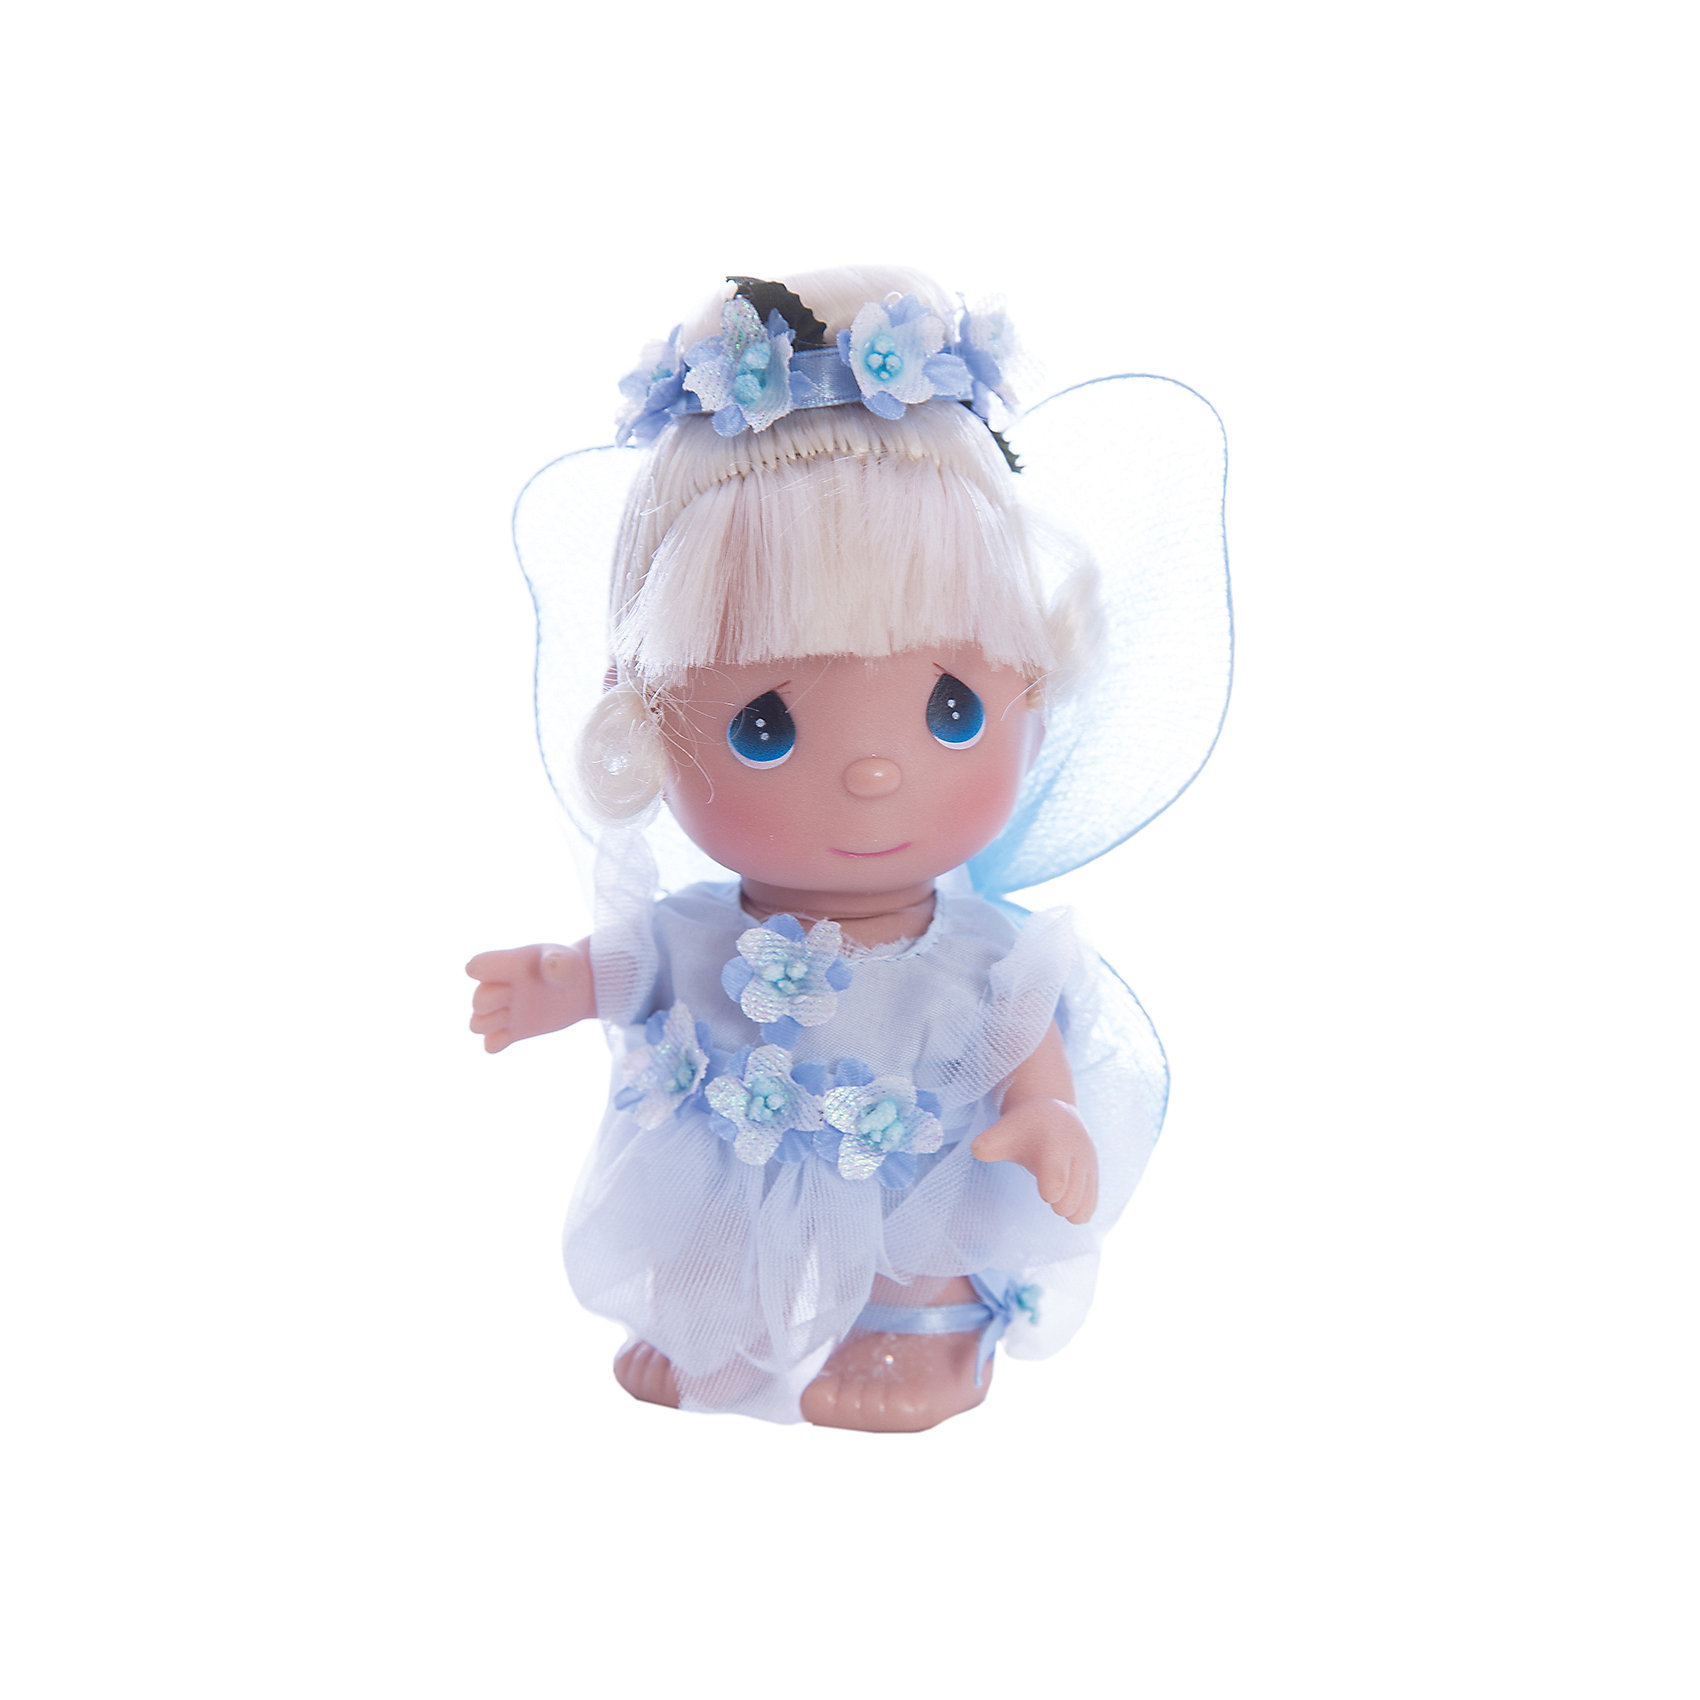 Кукла Фея в голубом, 14 см, Precious Moments<br><br>Ширина мм: 60<br>Глубина мм: 140<br>Высота мм: 40<br>Вес г: 80<br>Возраст от месяцев: 36<br>Возраст до месяцев: 2147483647<br>Пол: Женский<br>Возраст: Детский<br>SKU: 5482524